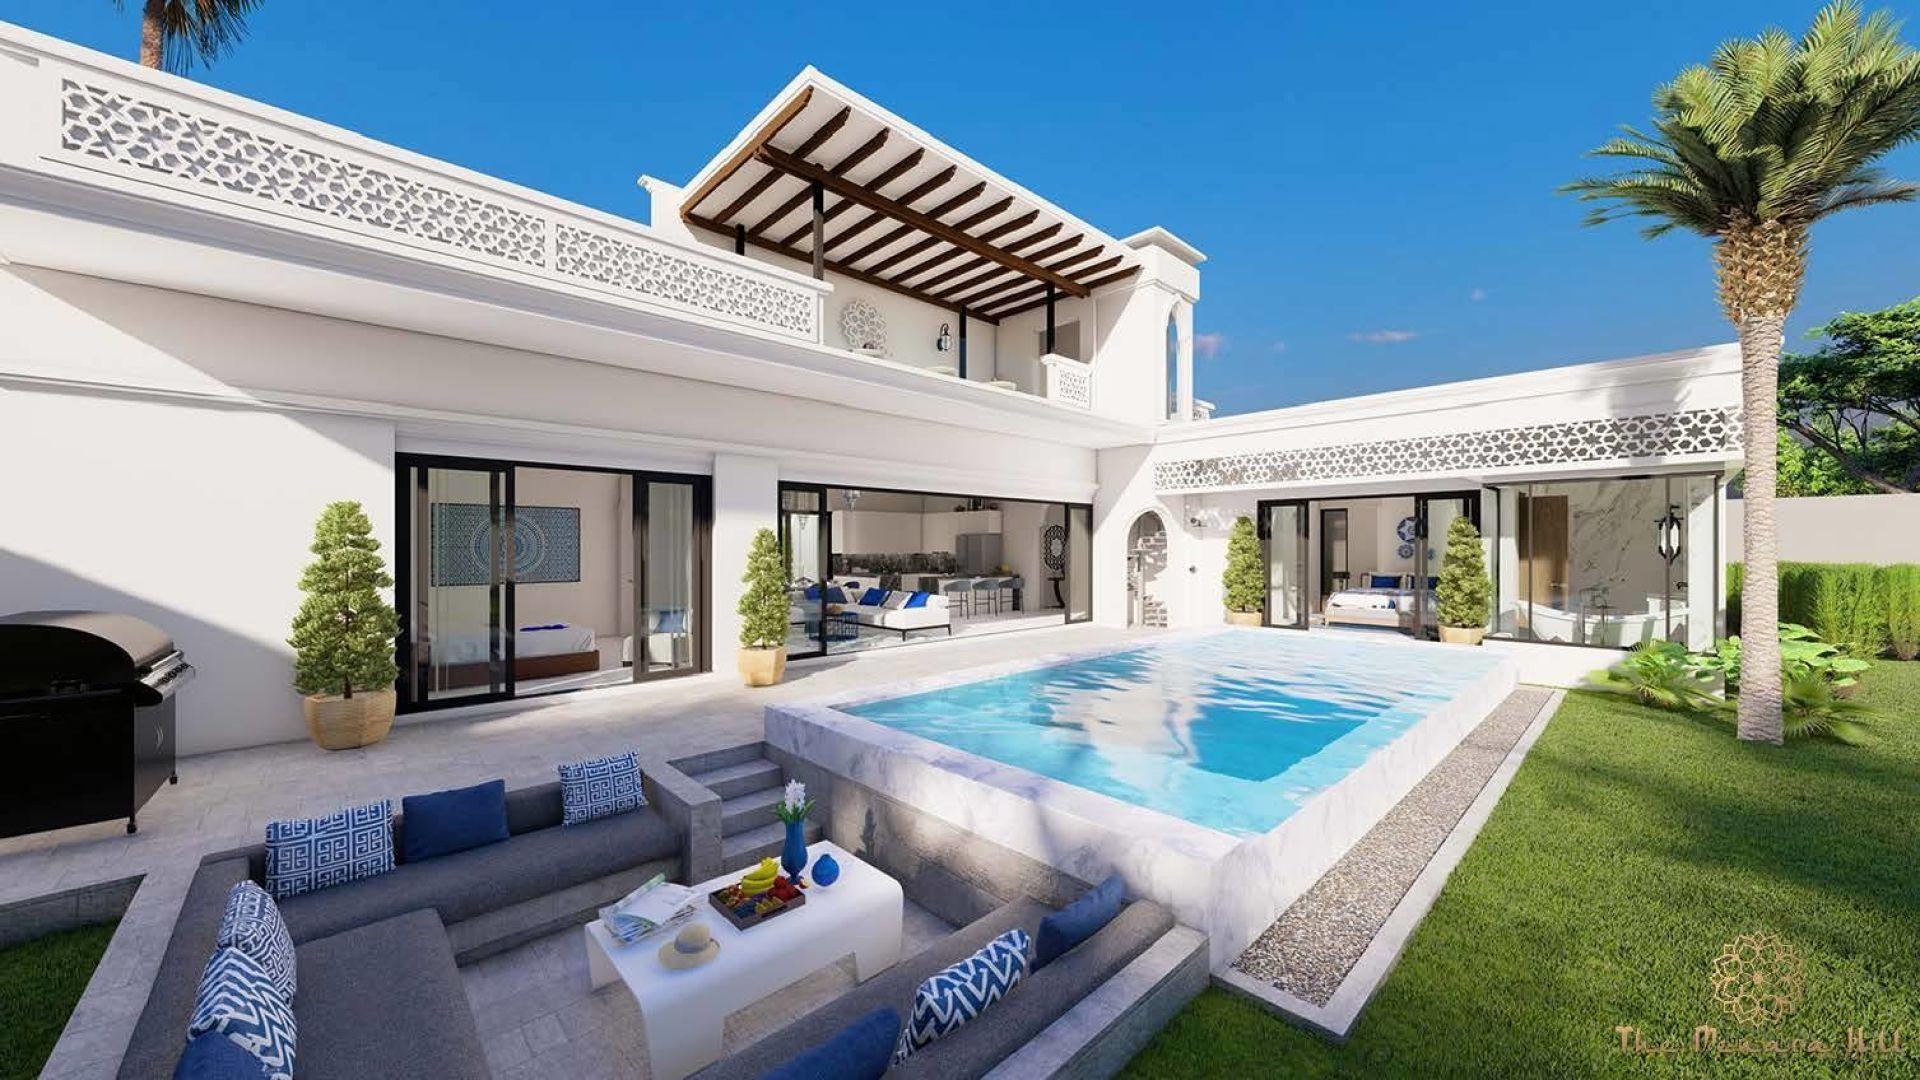 See The Menara Hill Luxury Pool Villa details